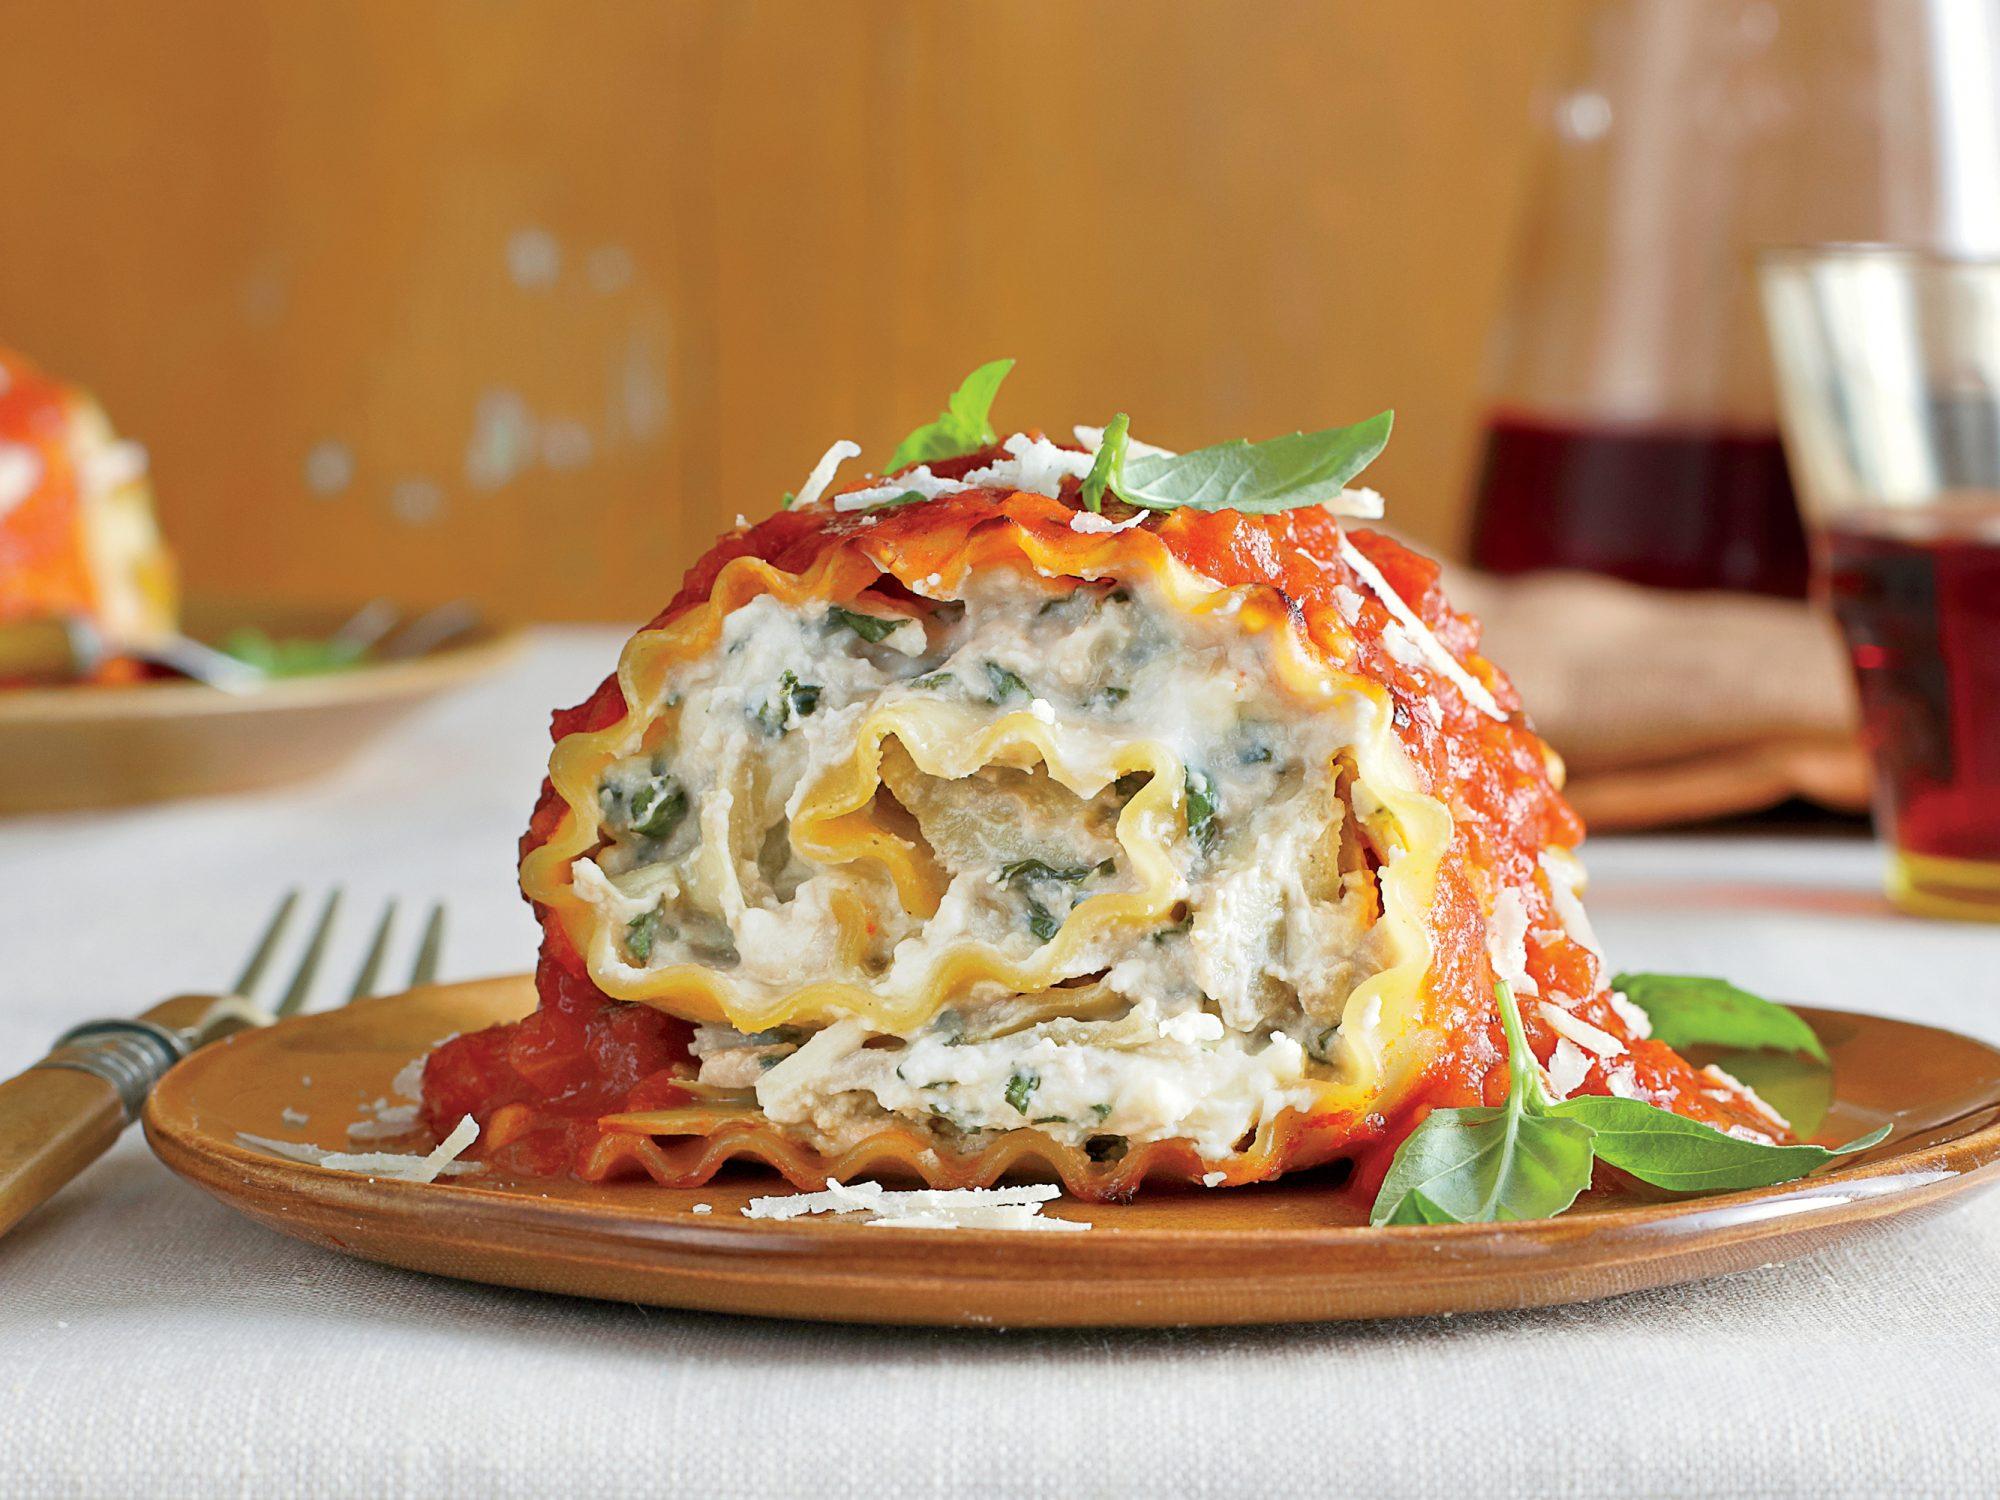 tomato basil lasagna rolls recipe myrecipes